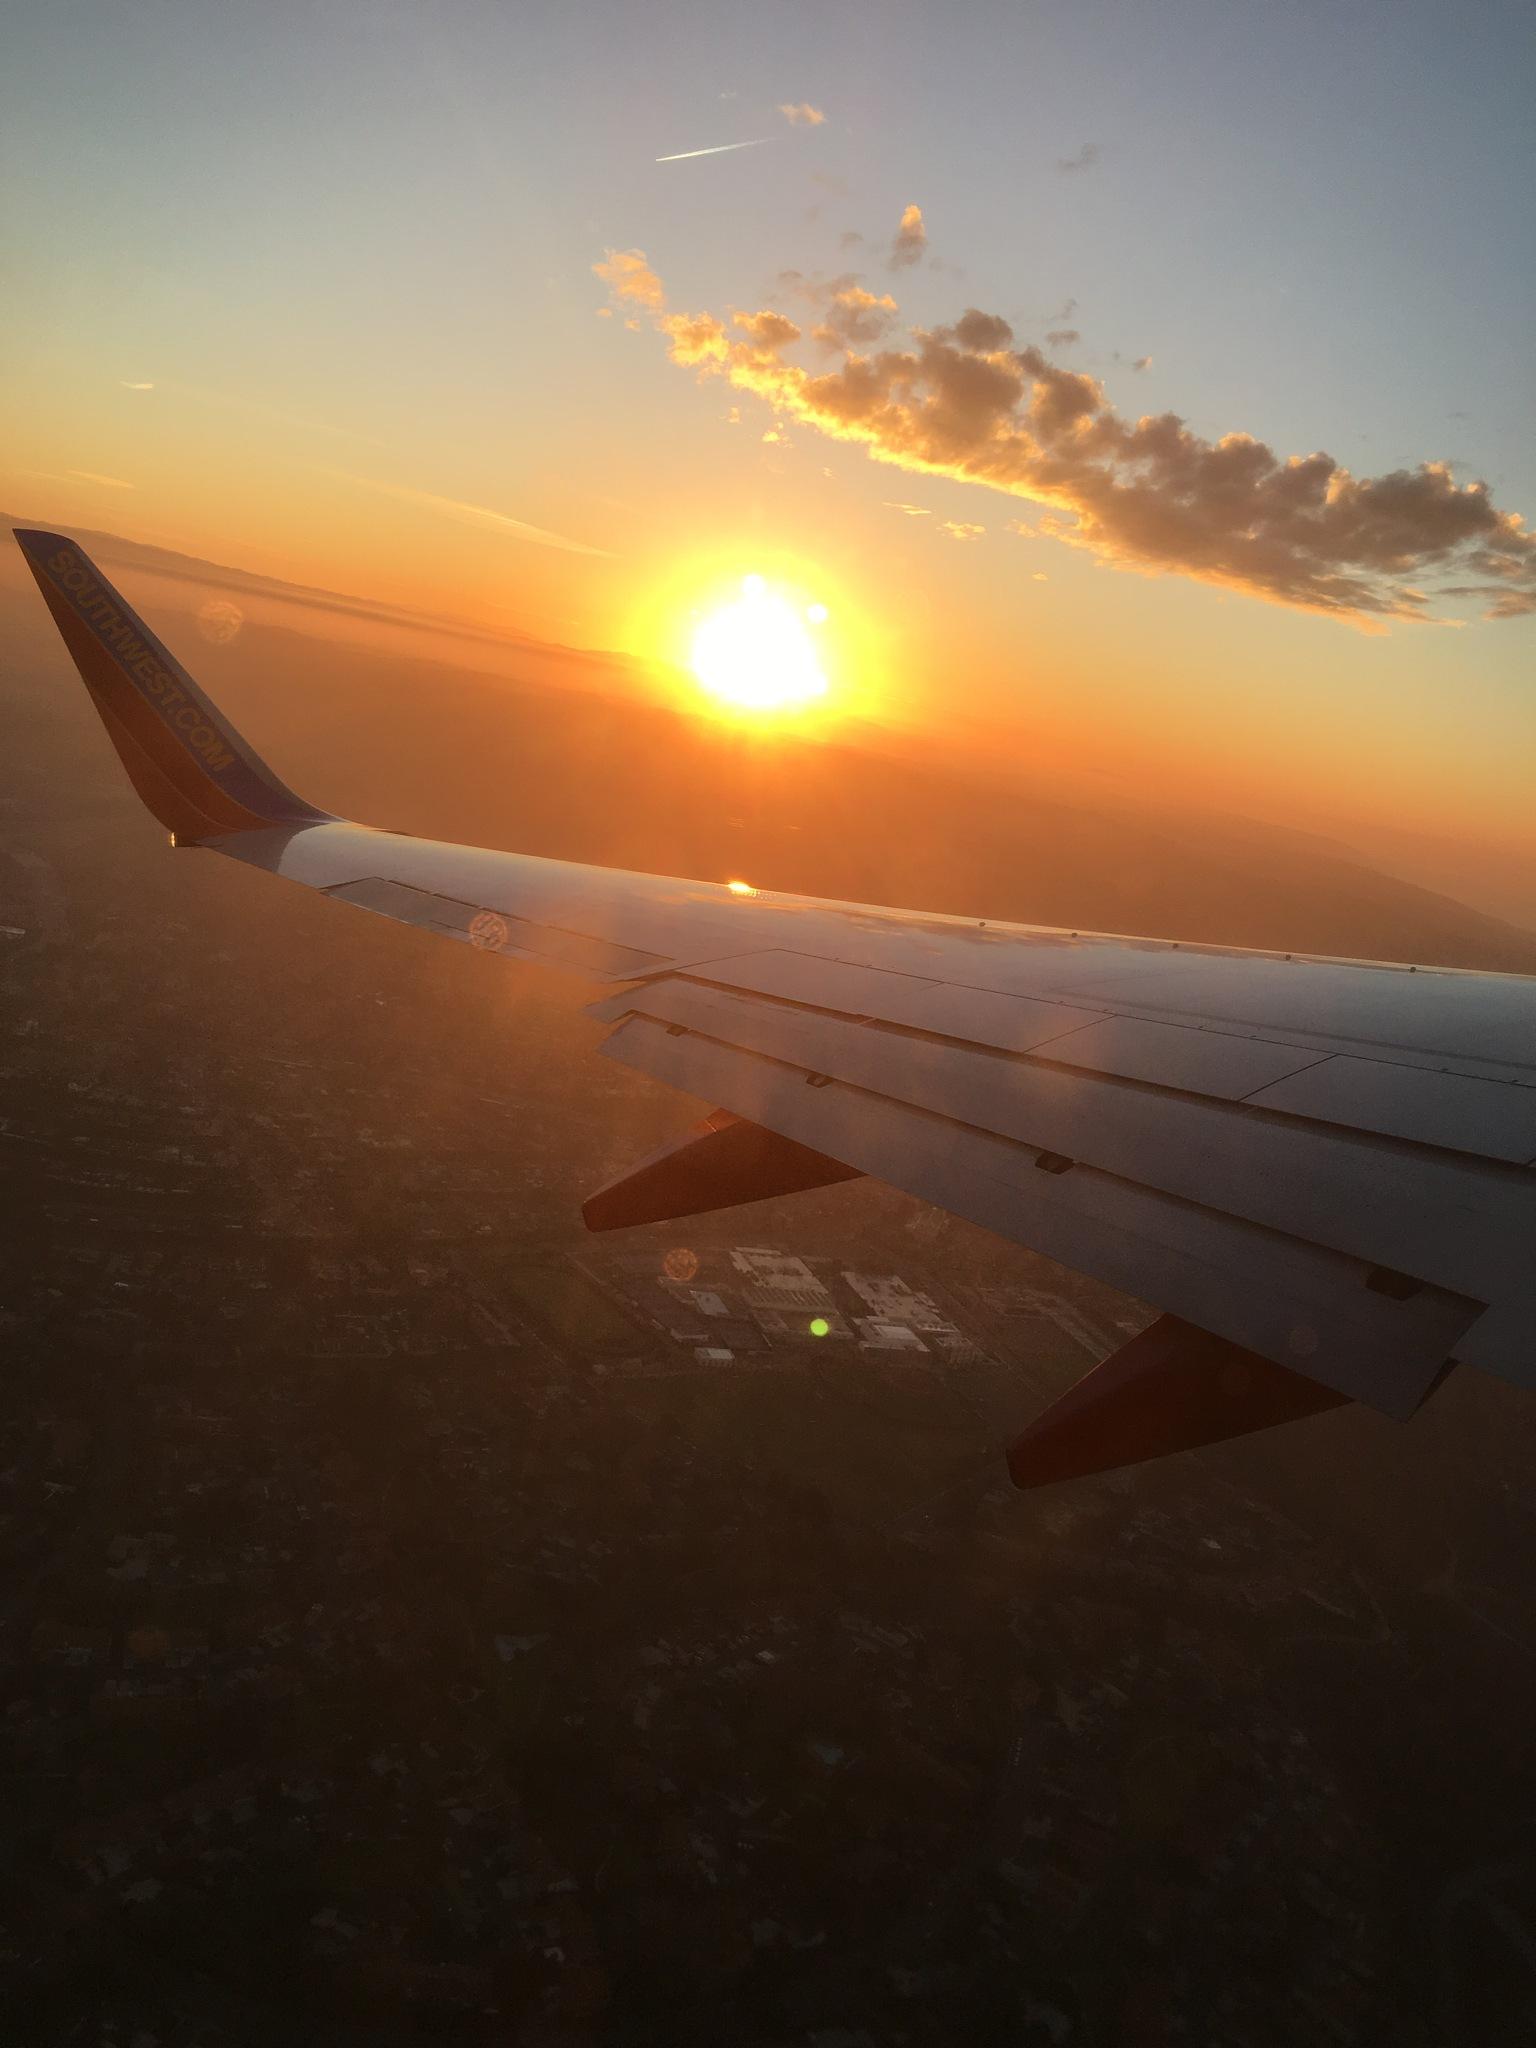 Over the sky by verokimart